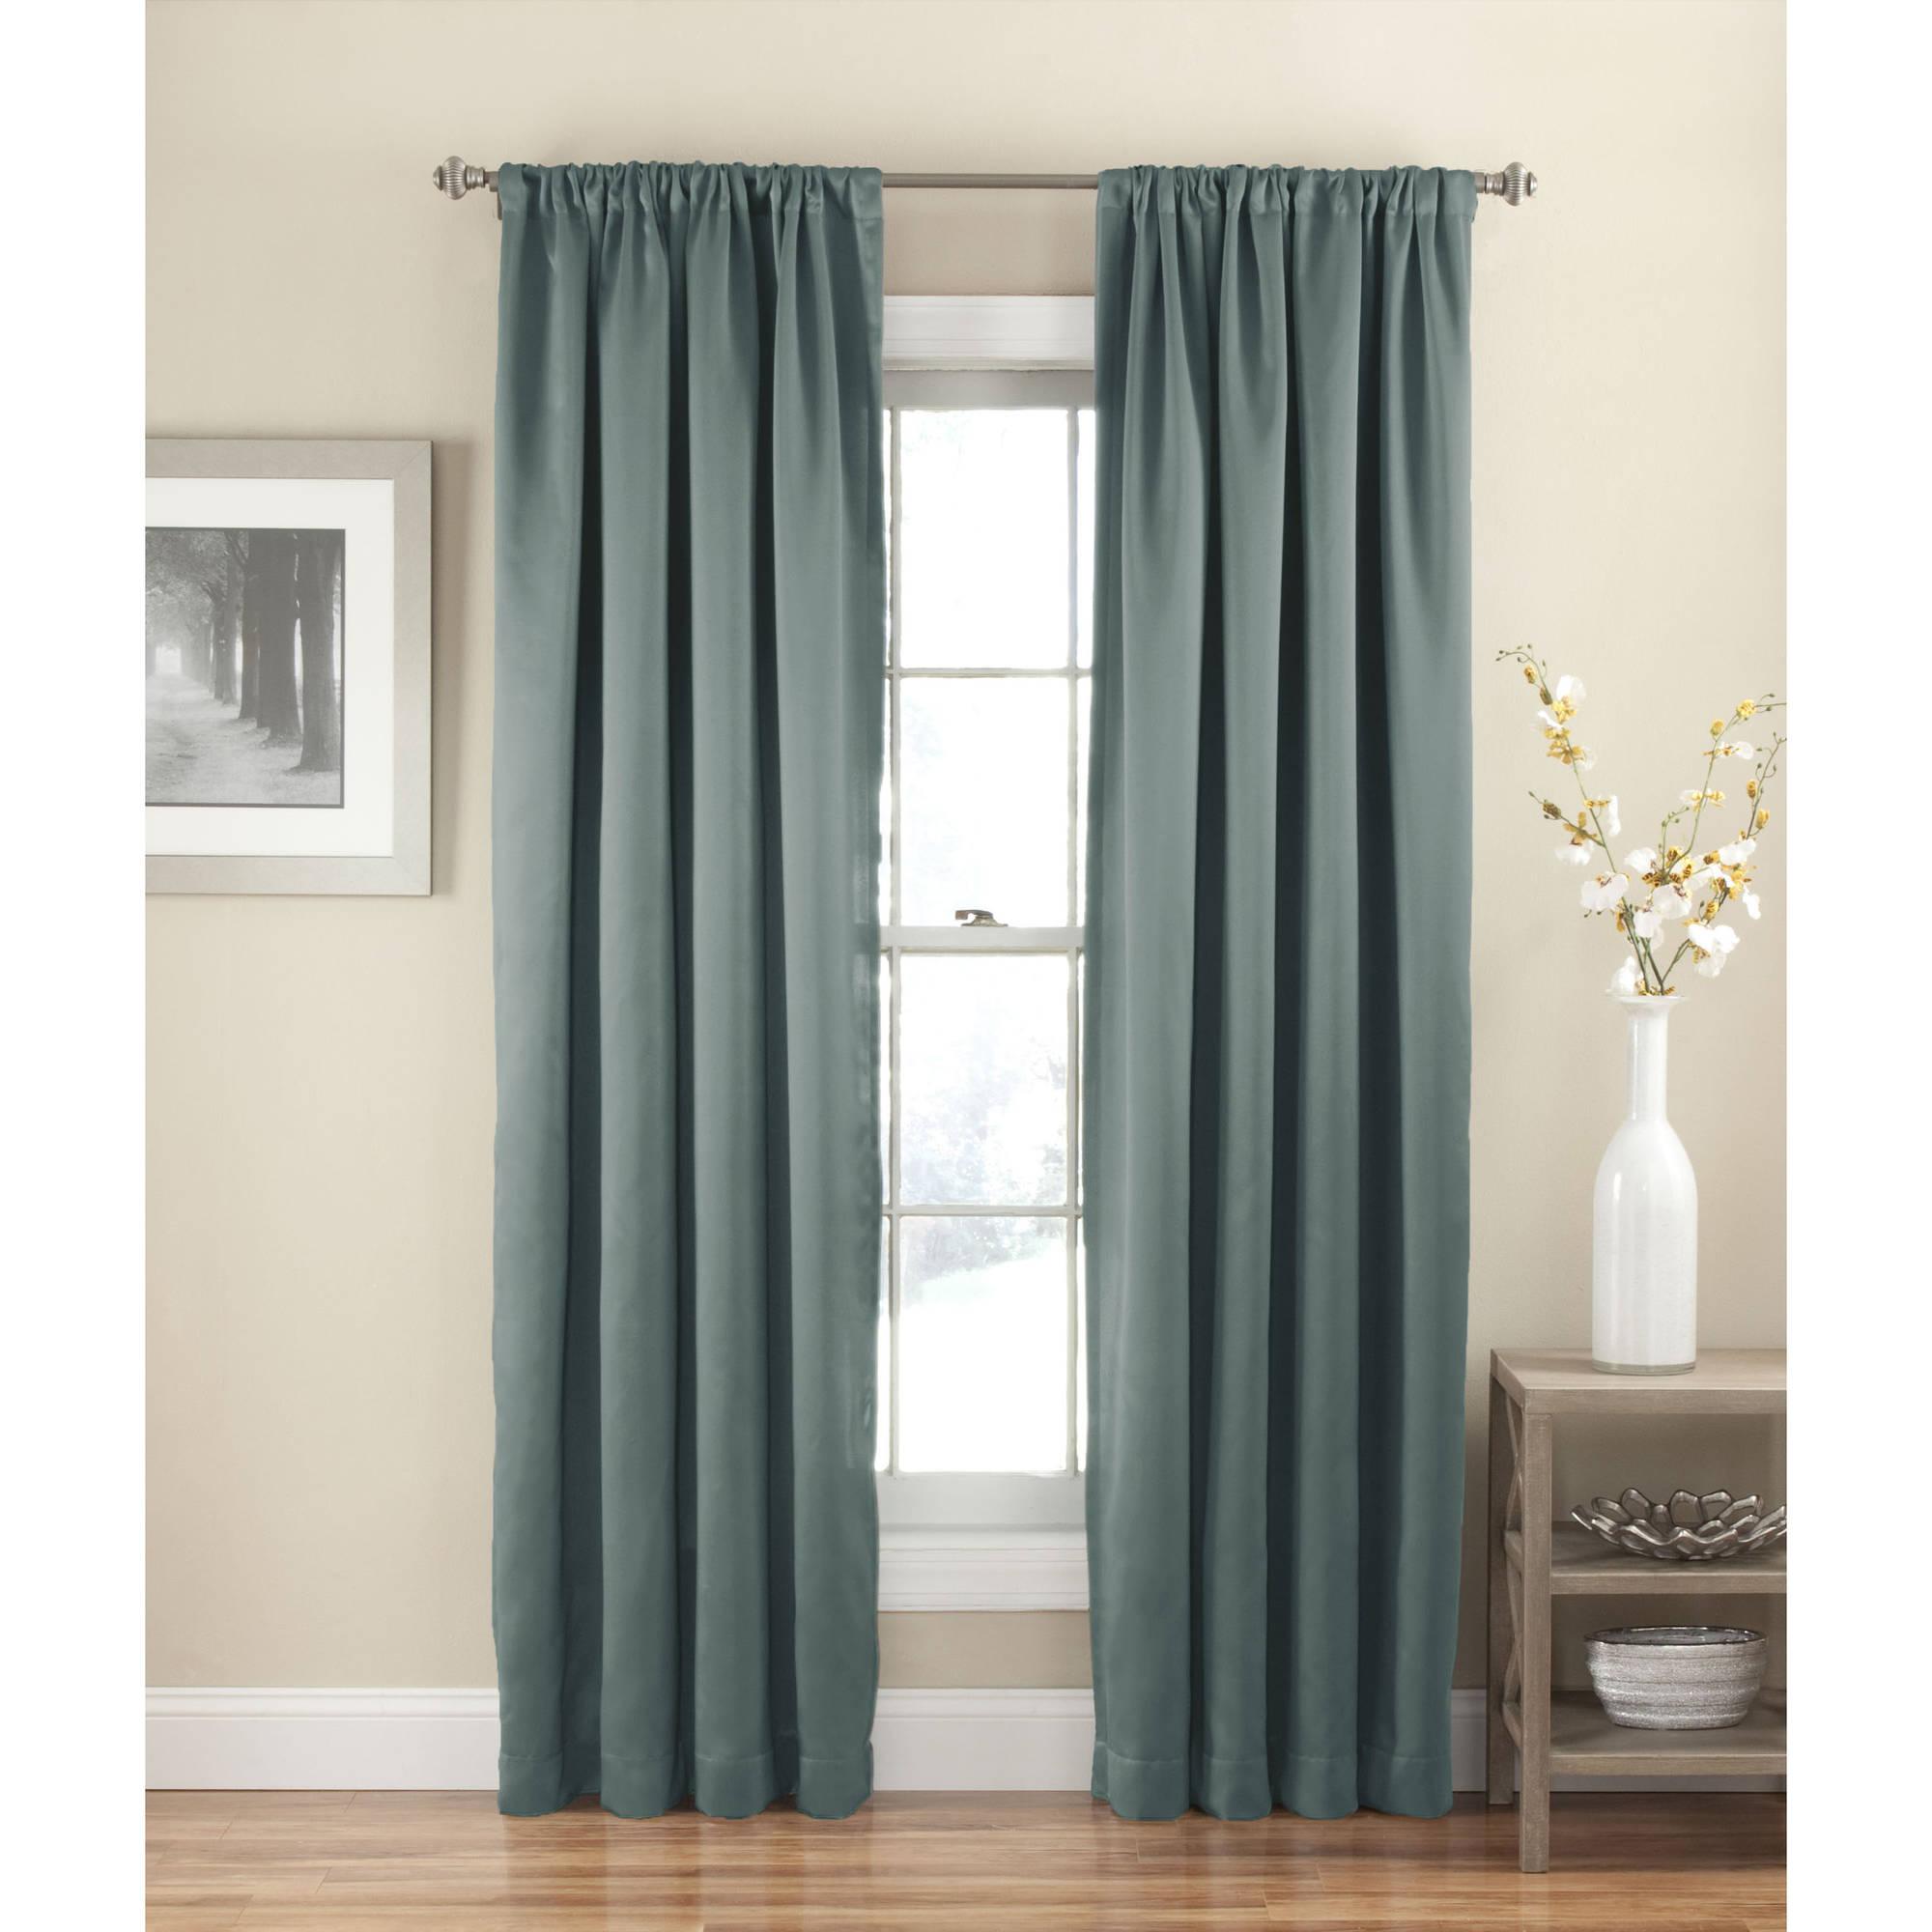 Eclipse Solid Thermapanel Room-Darkening Curtain (3 Colors) $5 @Walmart